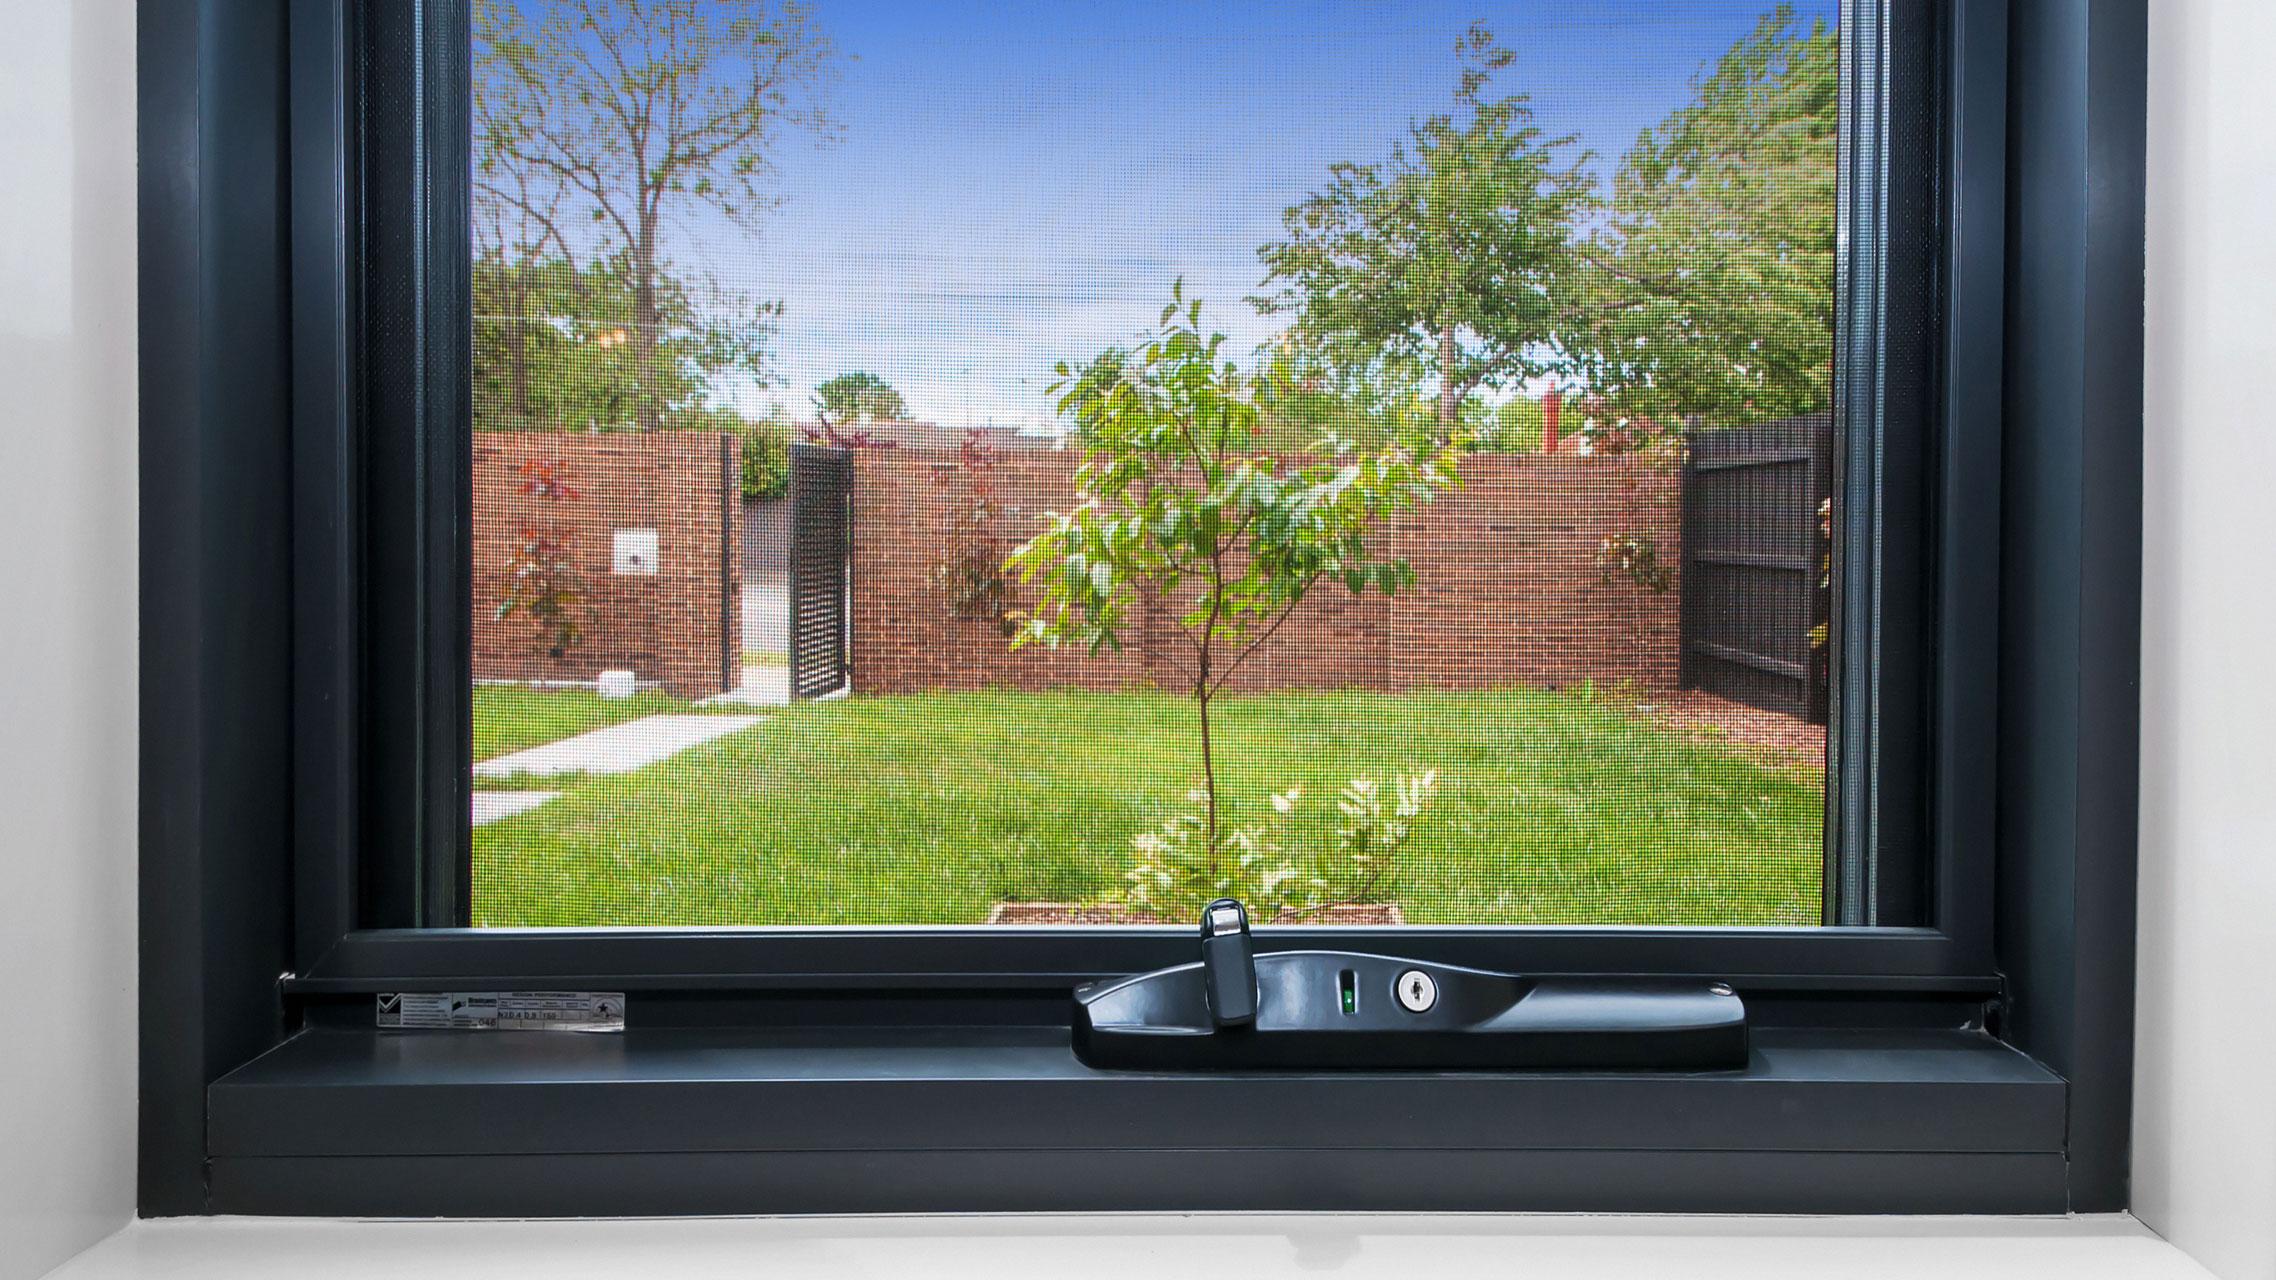 Close up of black awning window winder